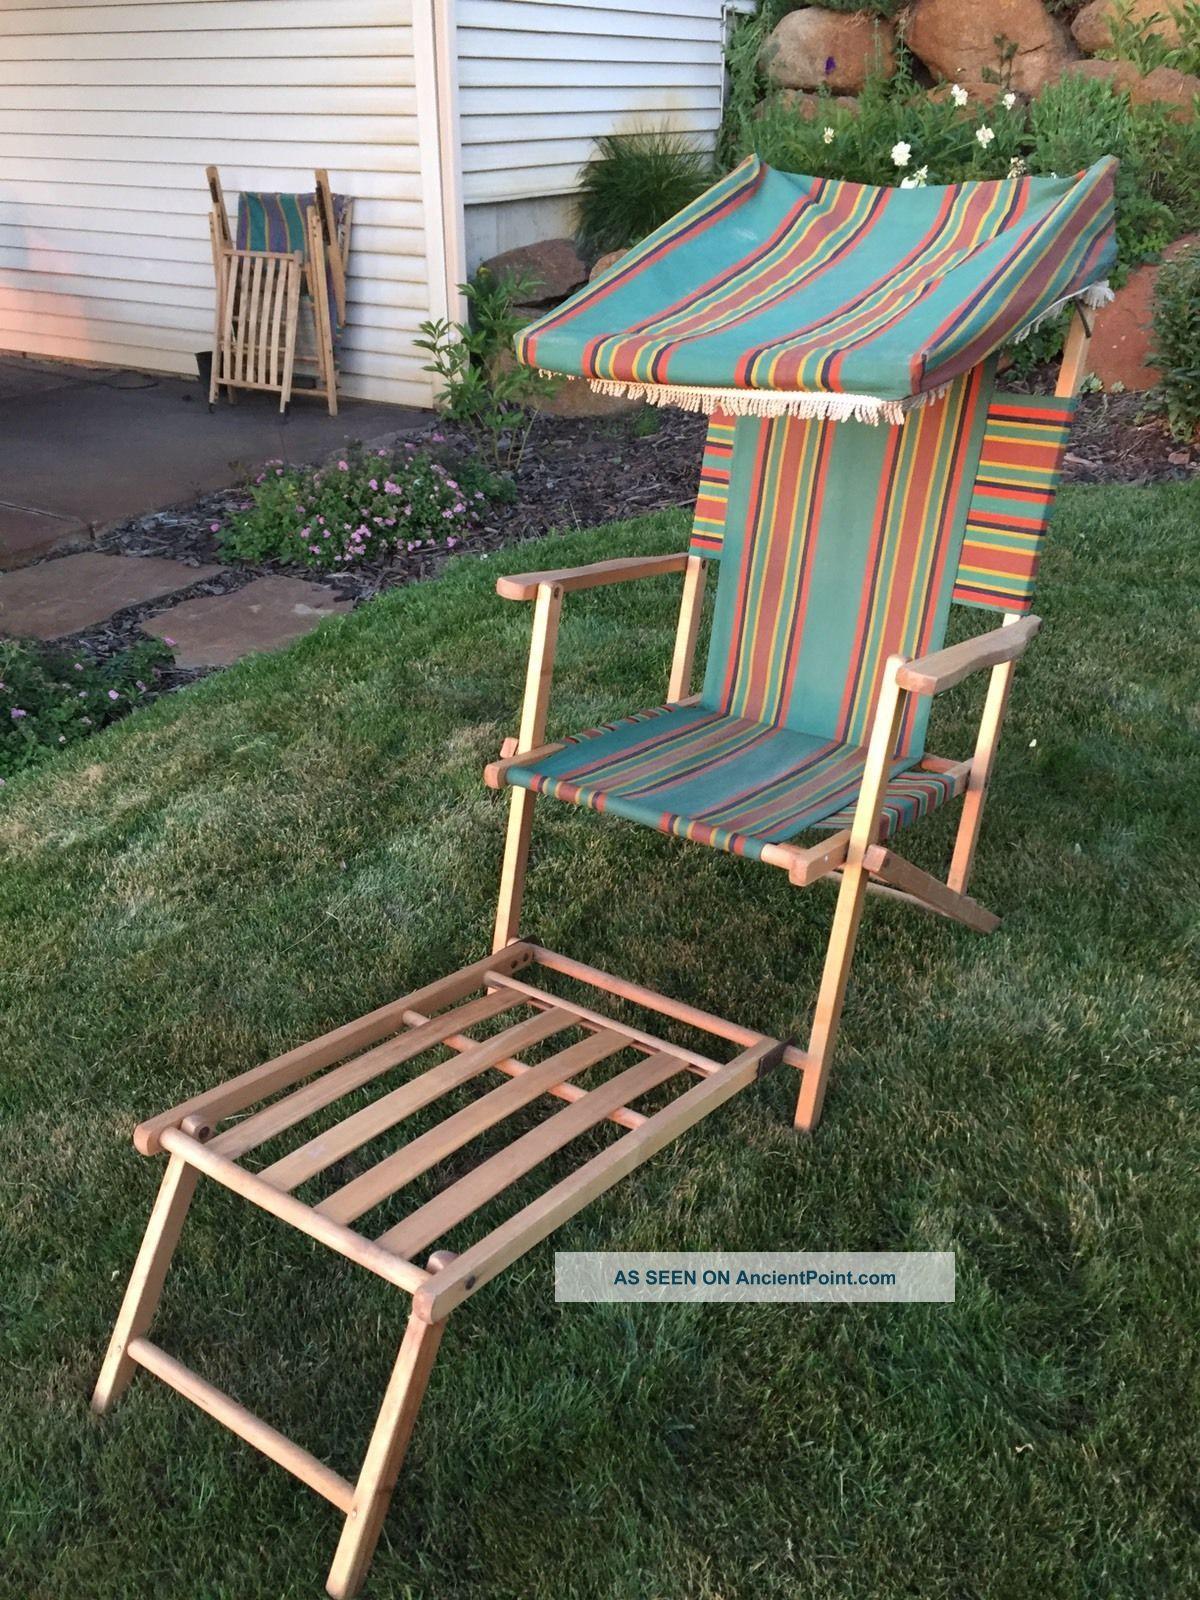 Vintage Fabric & Wood Folding Ship Deck Lawn Chair 100 1940 ' S 1 1900-1950 photo